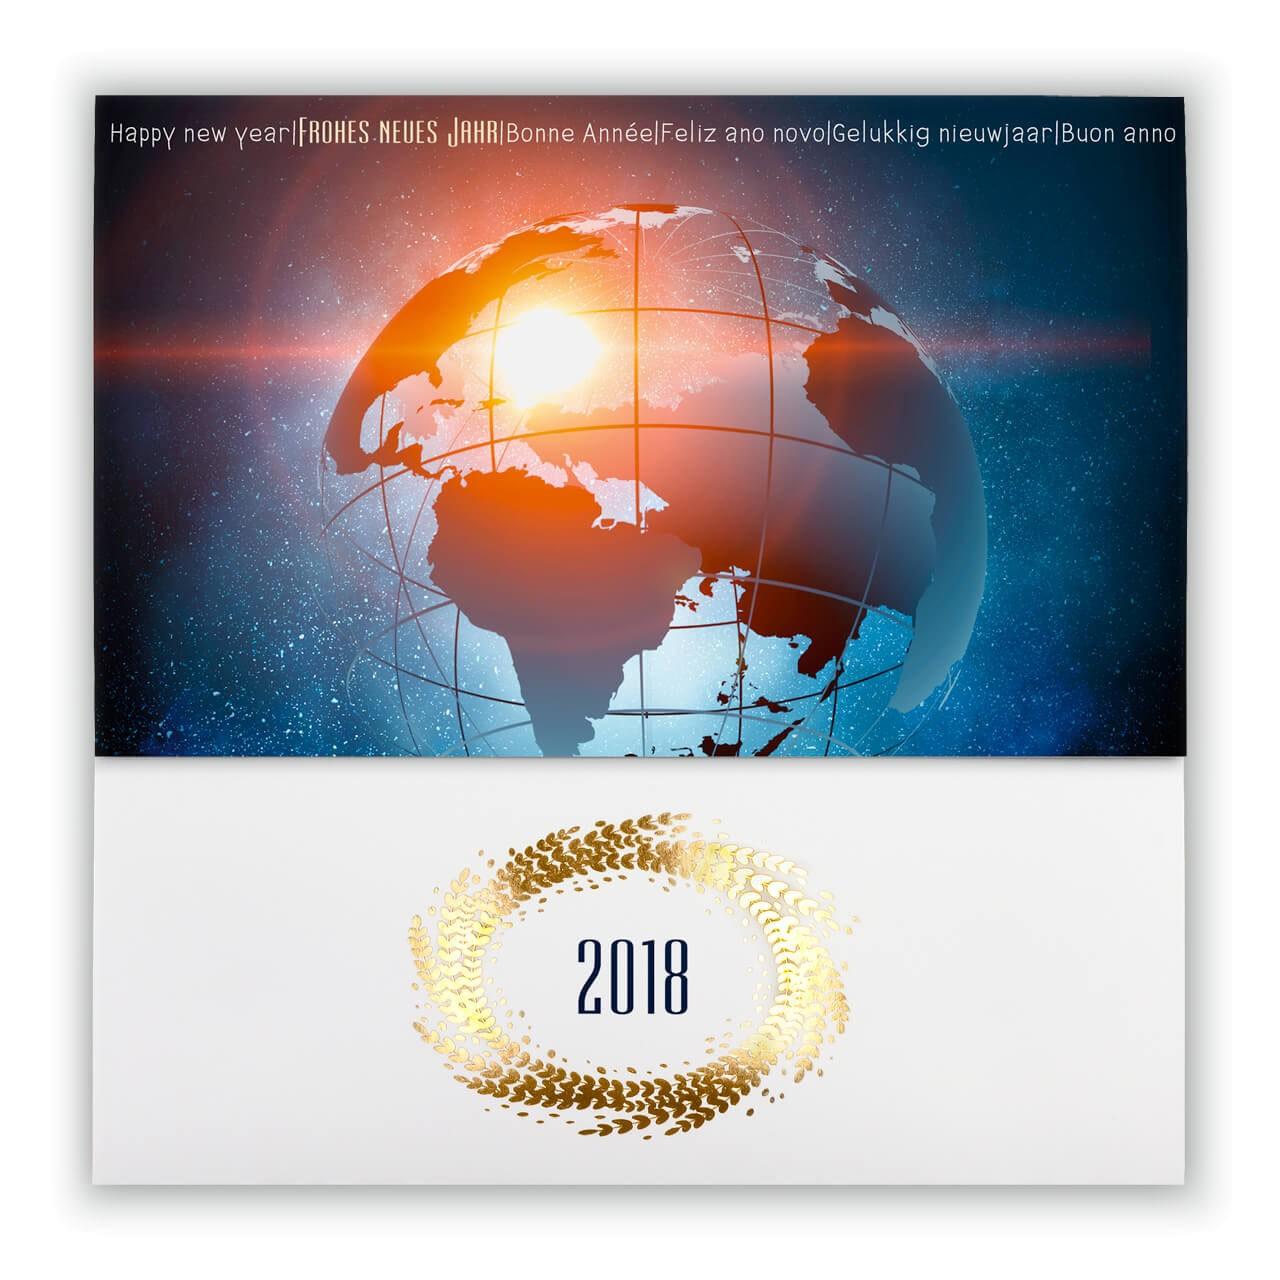 Globus Weltkugel Karte.Internationale Neujahrskarte 2018 Mit Globus Weltkugel